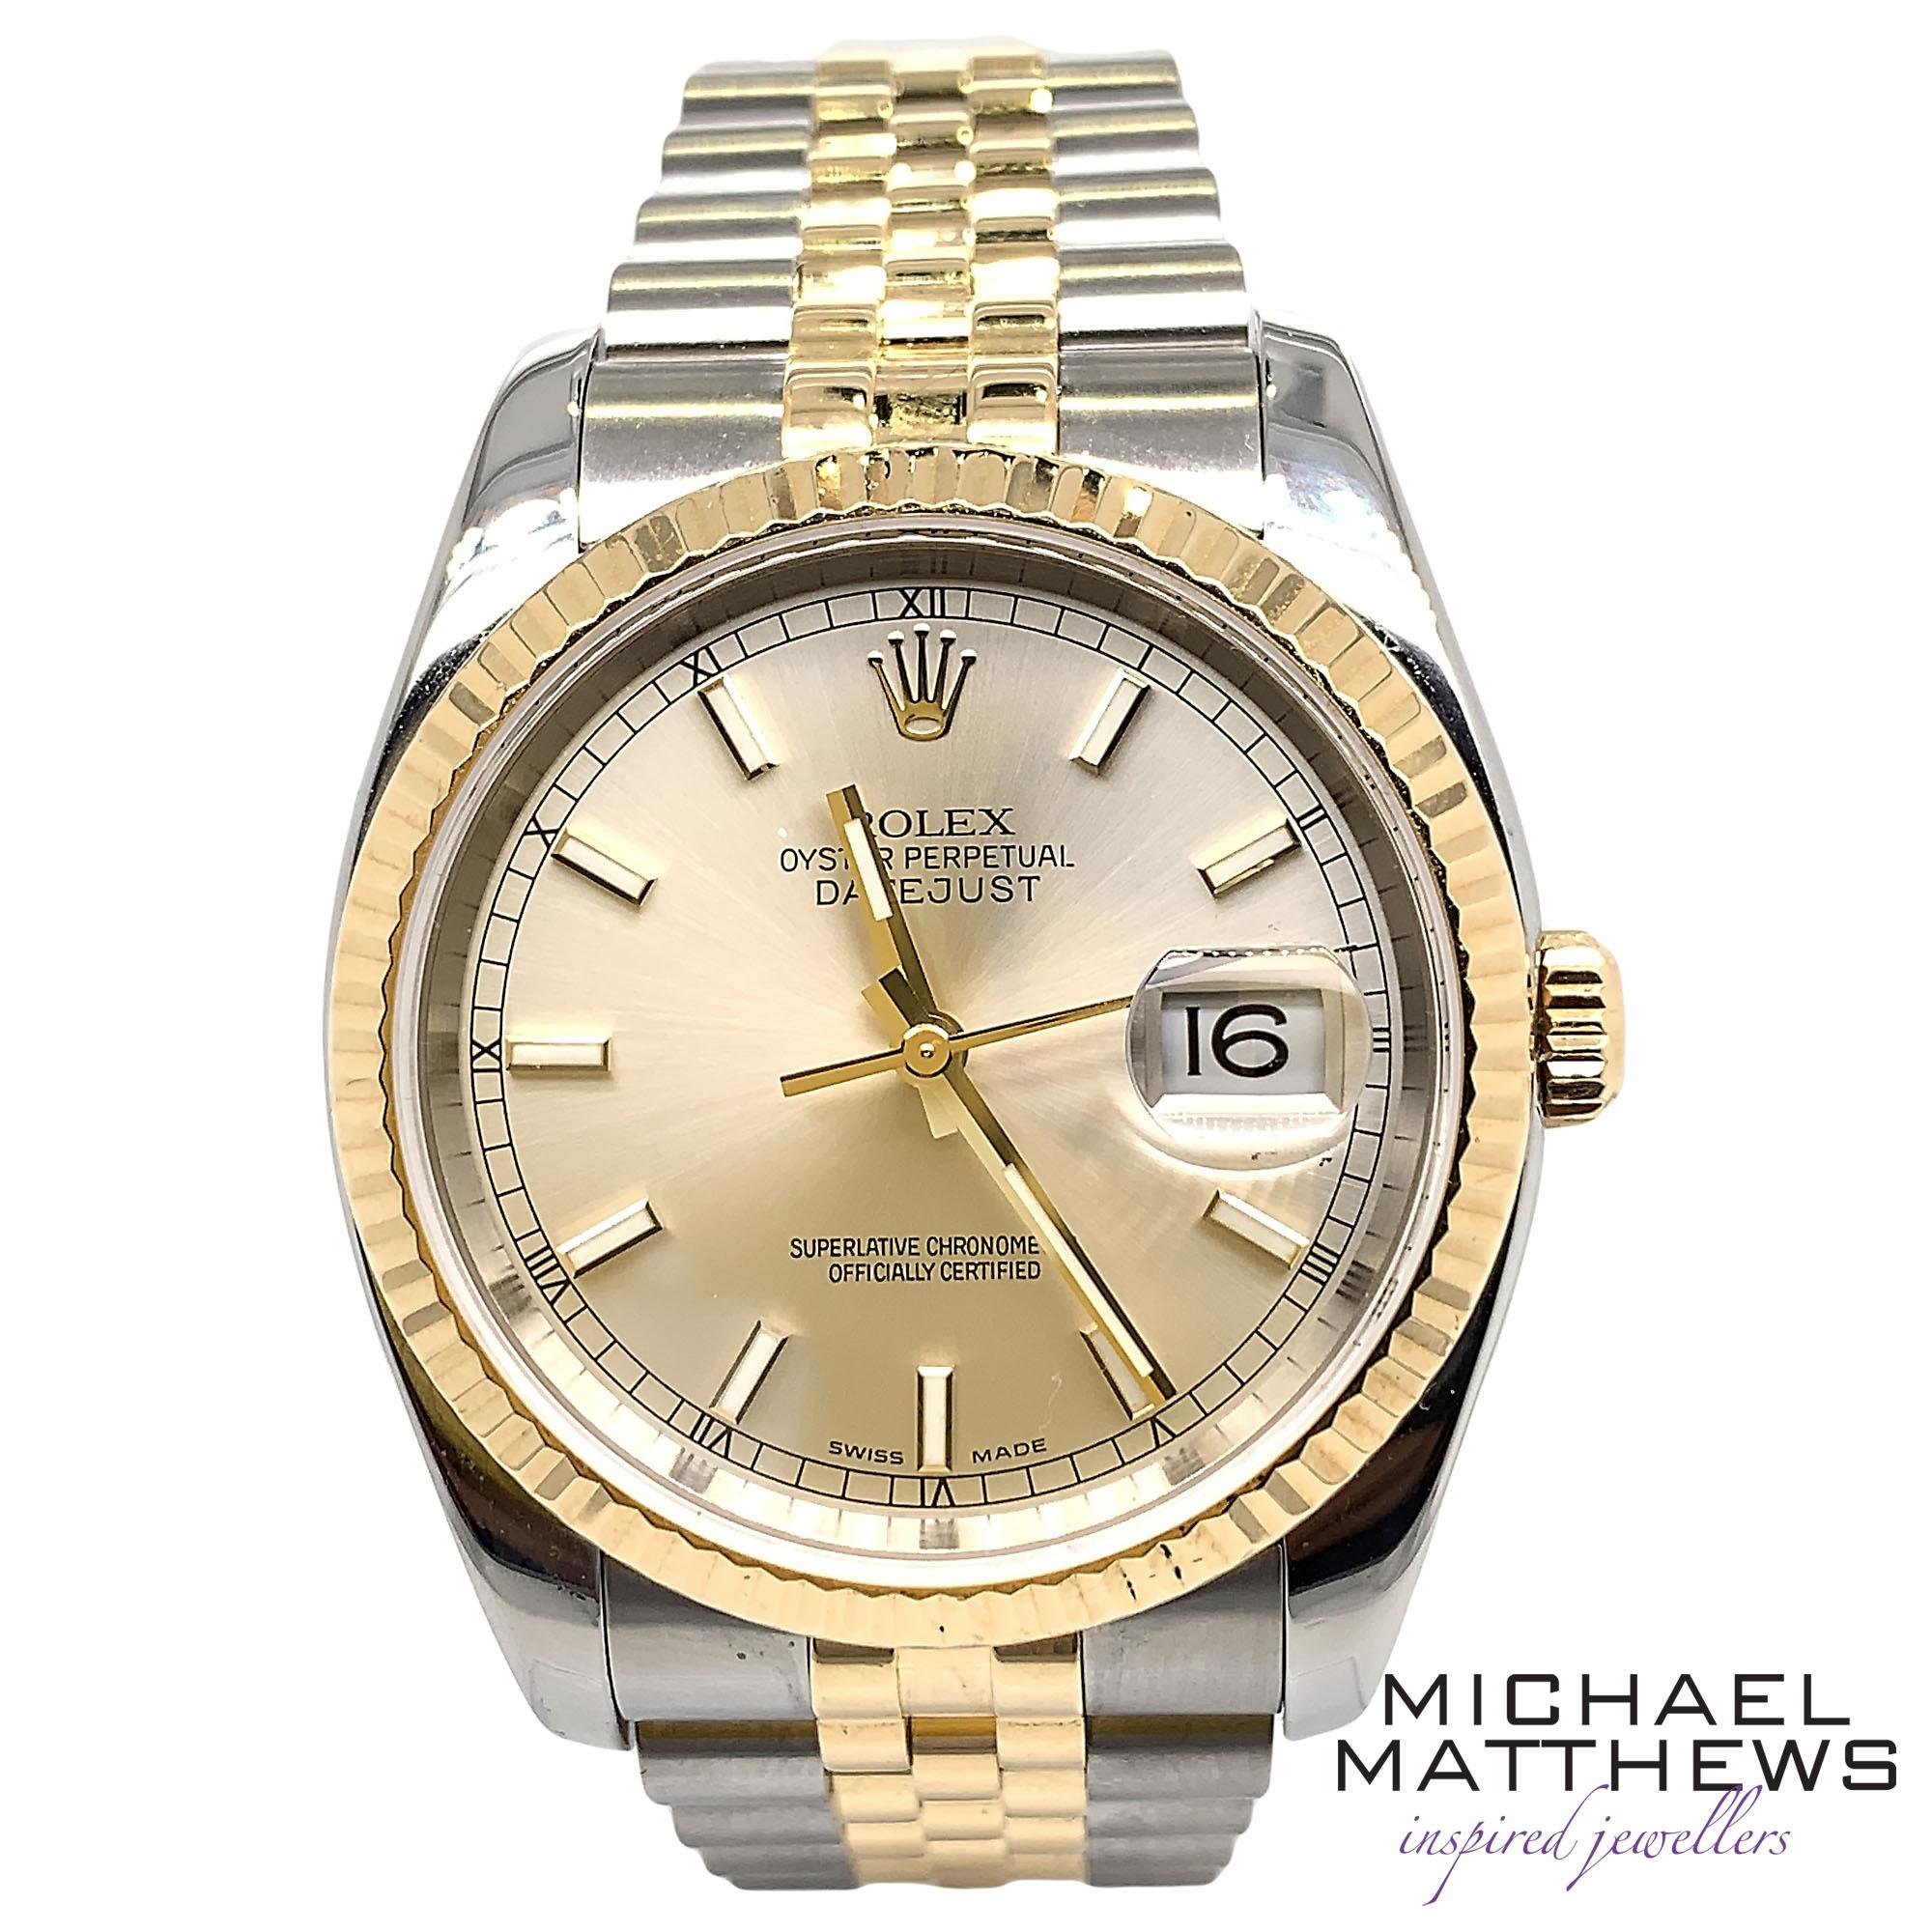 dd009c94dd3 Rolex DateJust 36mm Watch — Michael Matthews Jewellery - Bournemouth & Fareham  Jewellers